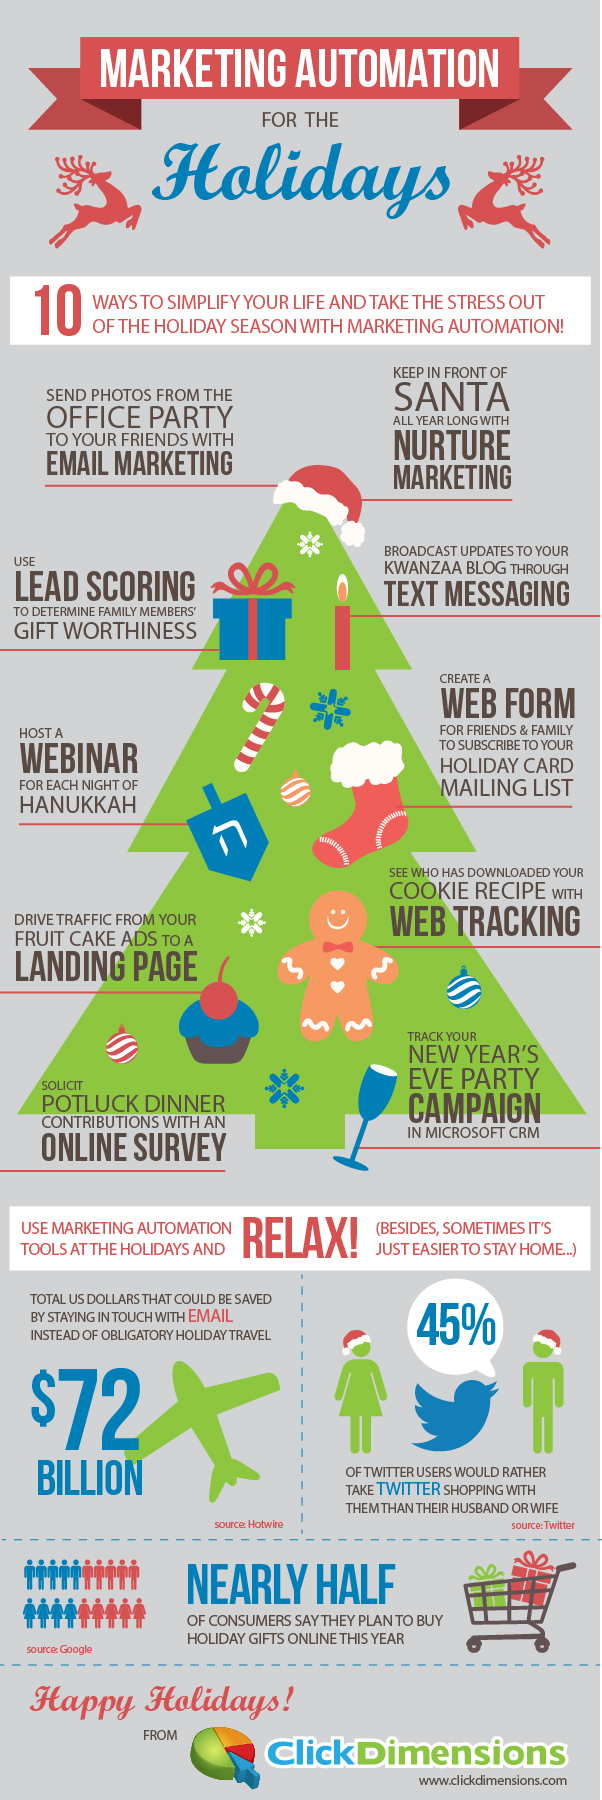 MarketingAutomation-Holidays